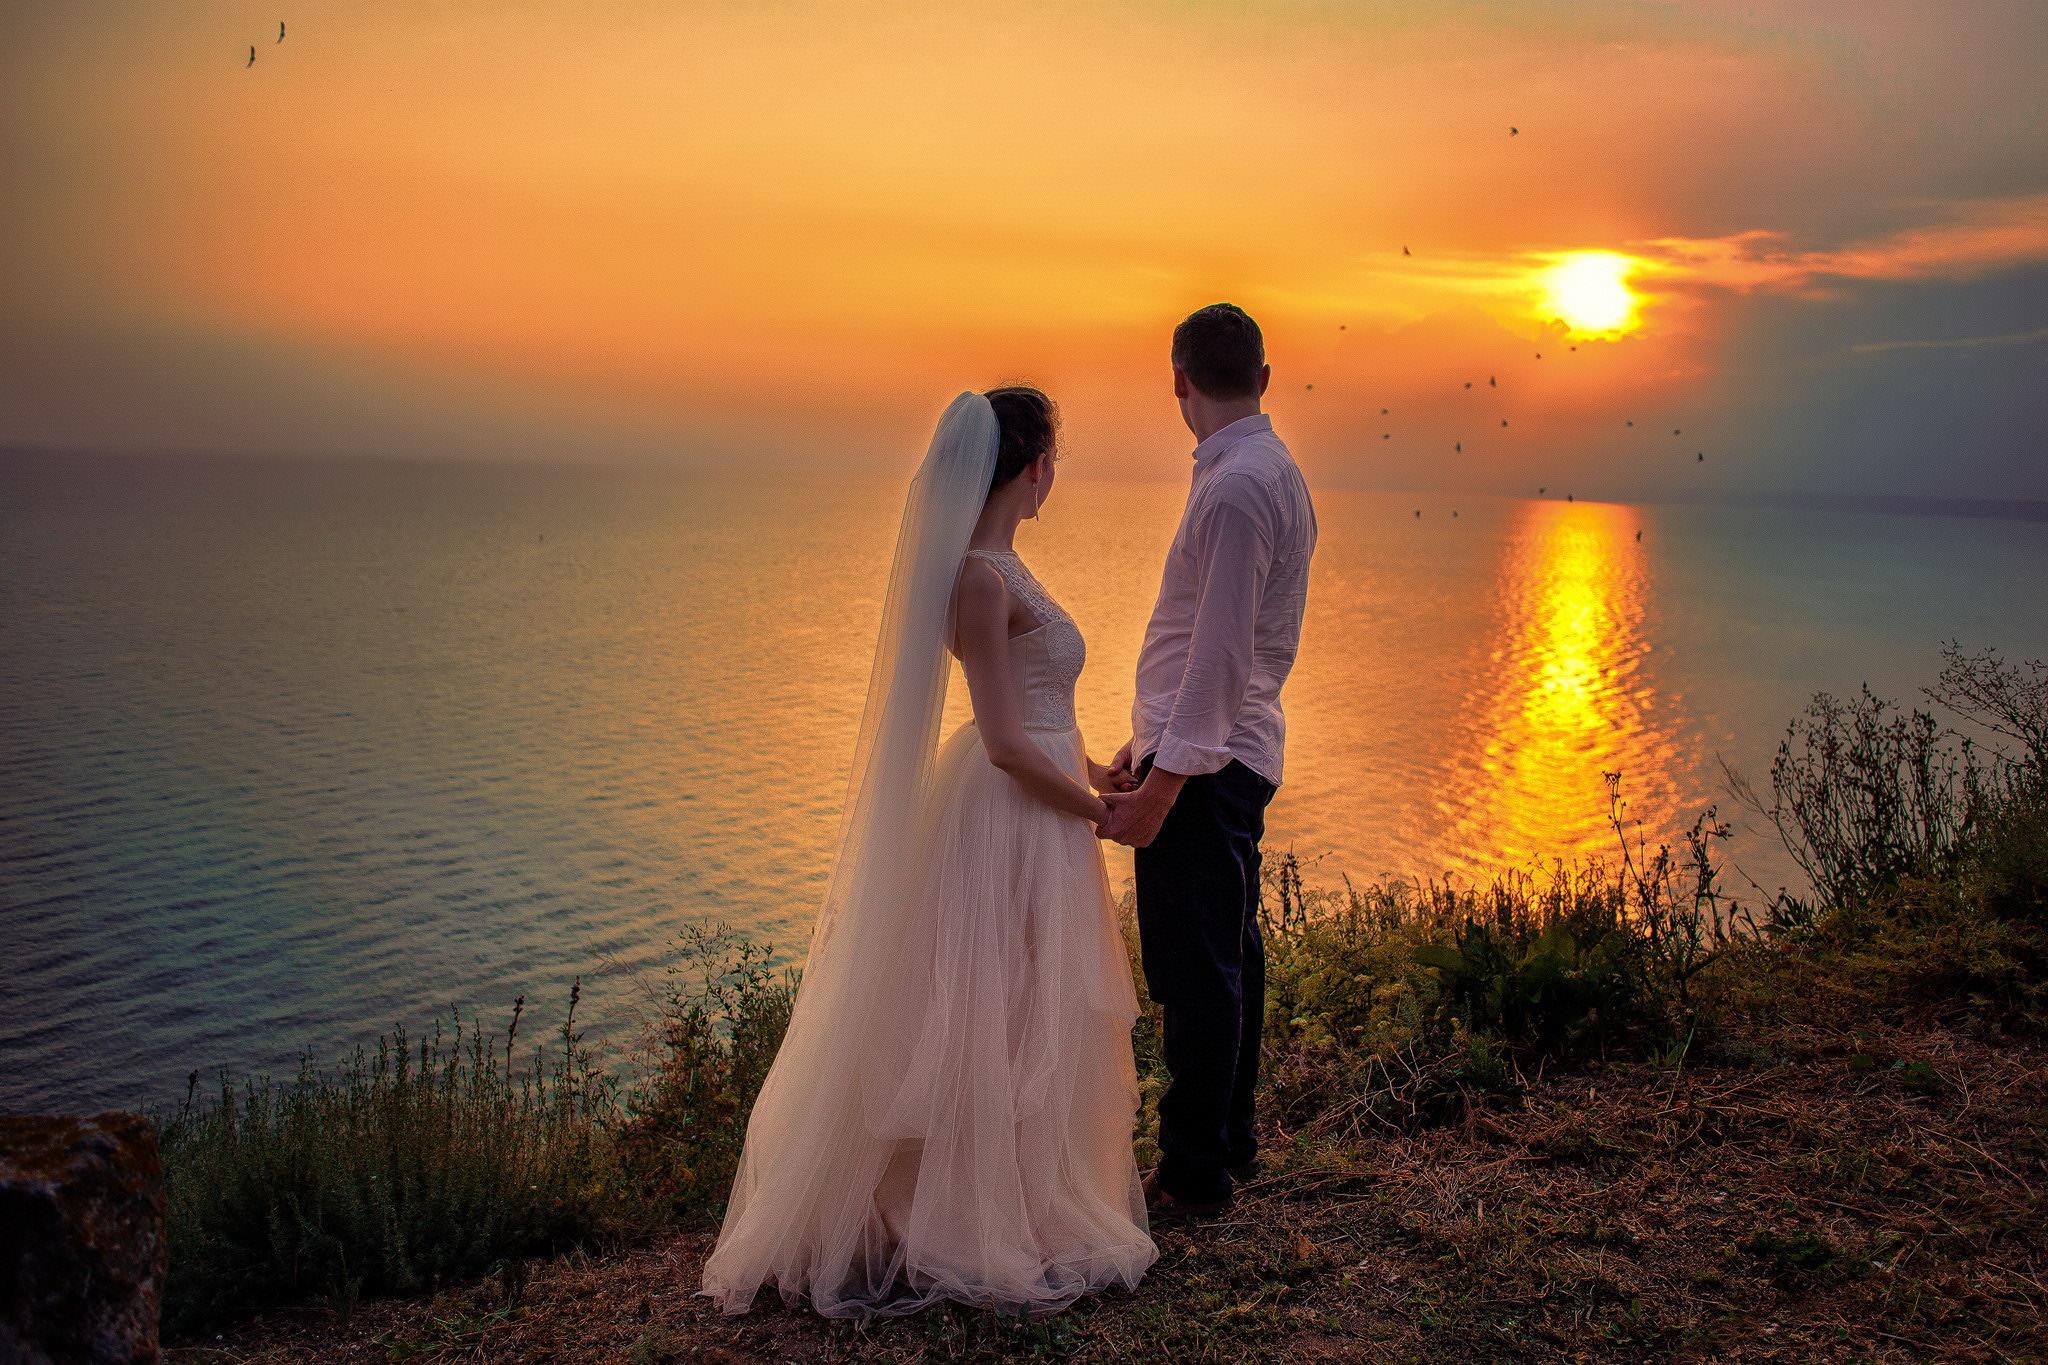 fotograf de nunta, fotograf nunta, fotograf Targoviste, fotograf Ploiesti, fotograf Bucuresti, fotografie de nunta, wedding, fotograf profesionist, foto nunta, poze nunta, trash the dress, fotografi de nunta, fotografii nunta